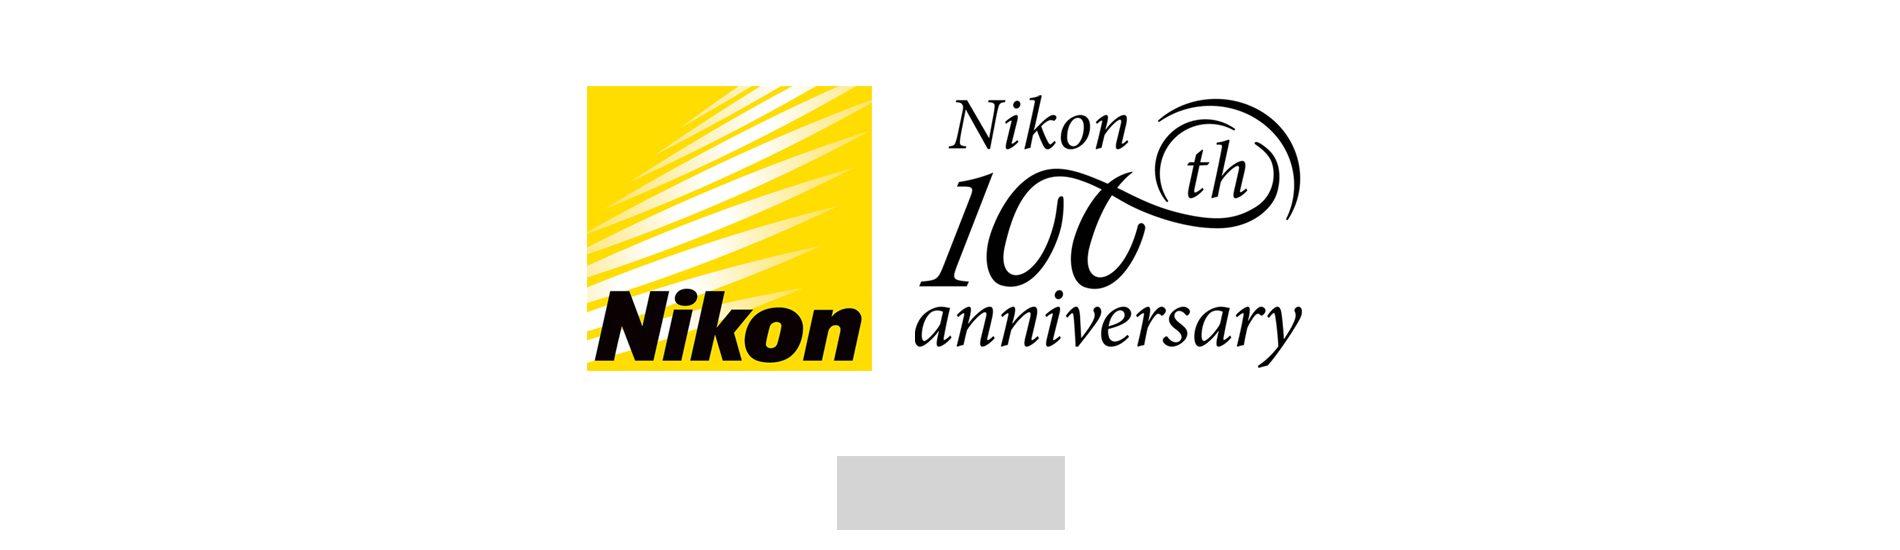 nikon-banner-grey2